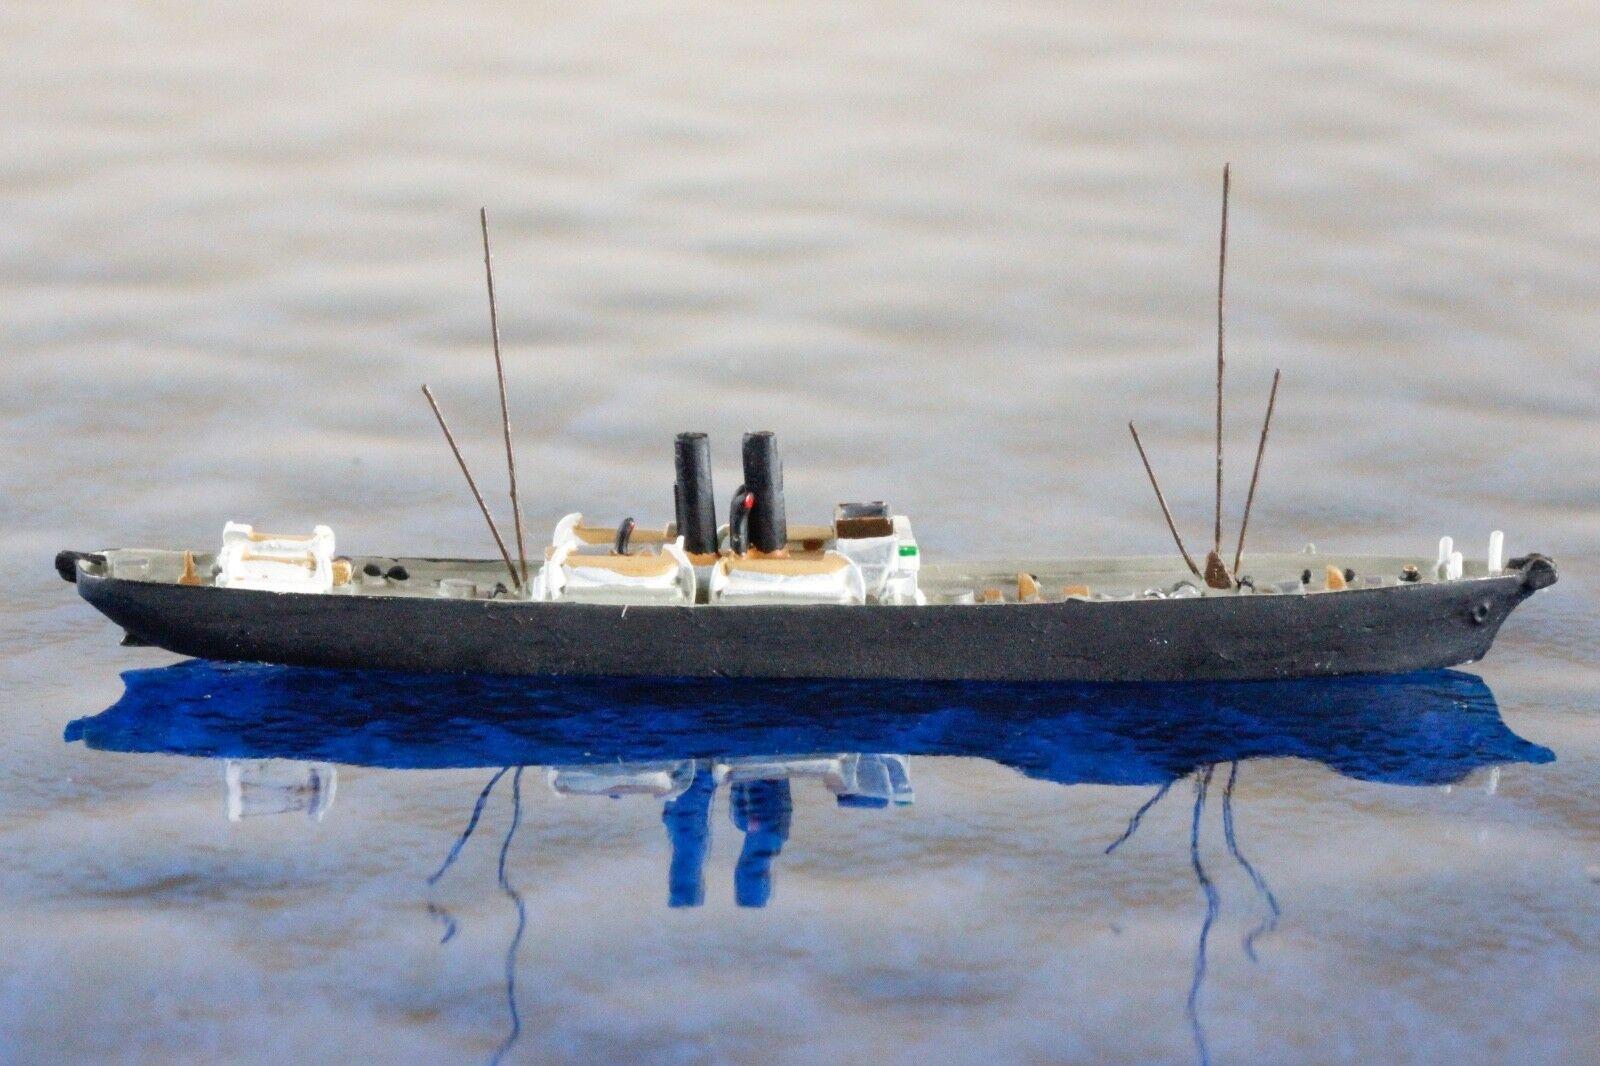 De fabricantes podbielski welfia 34,1 1250 barco modelo